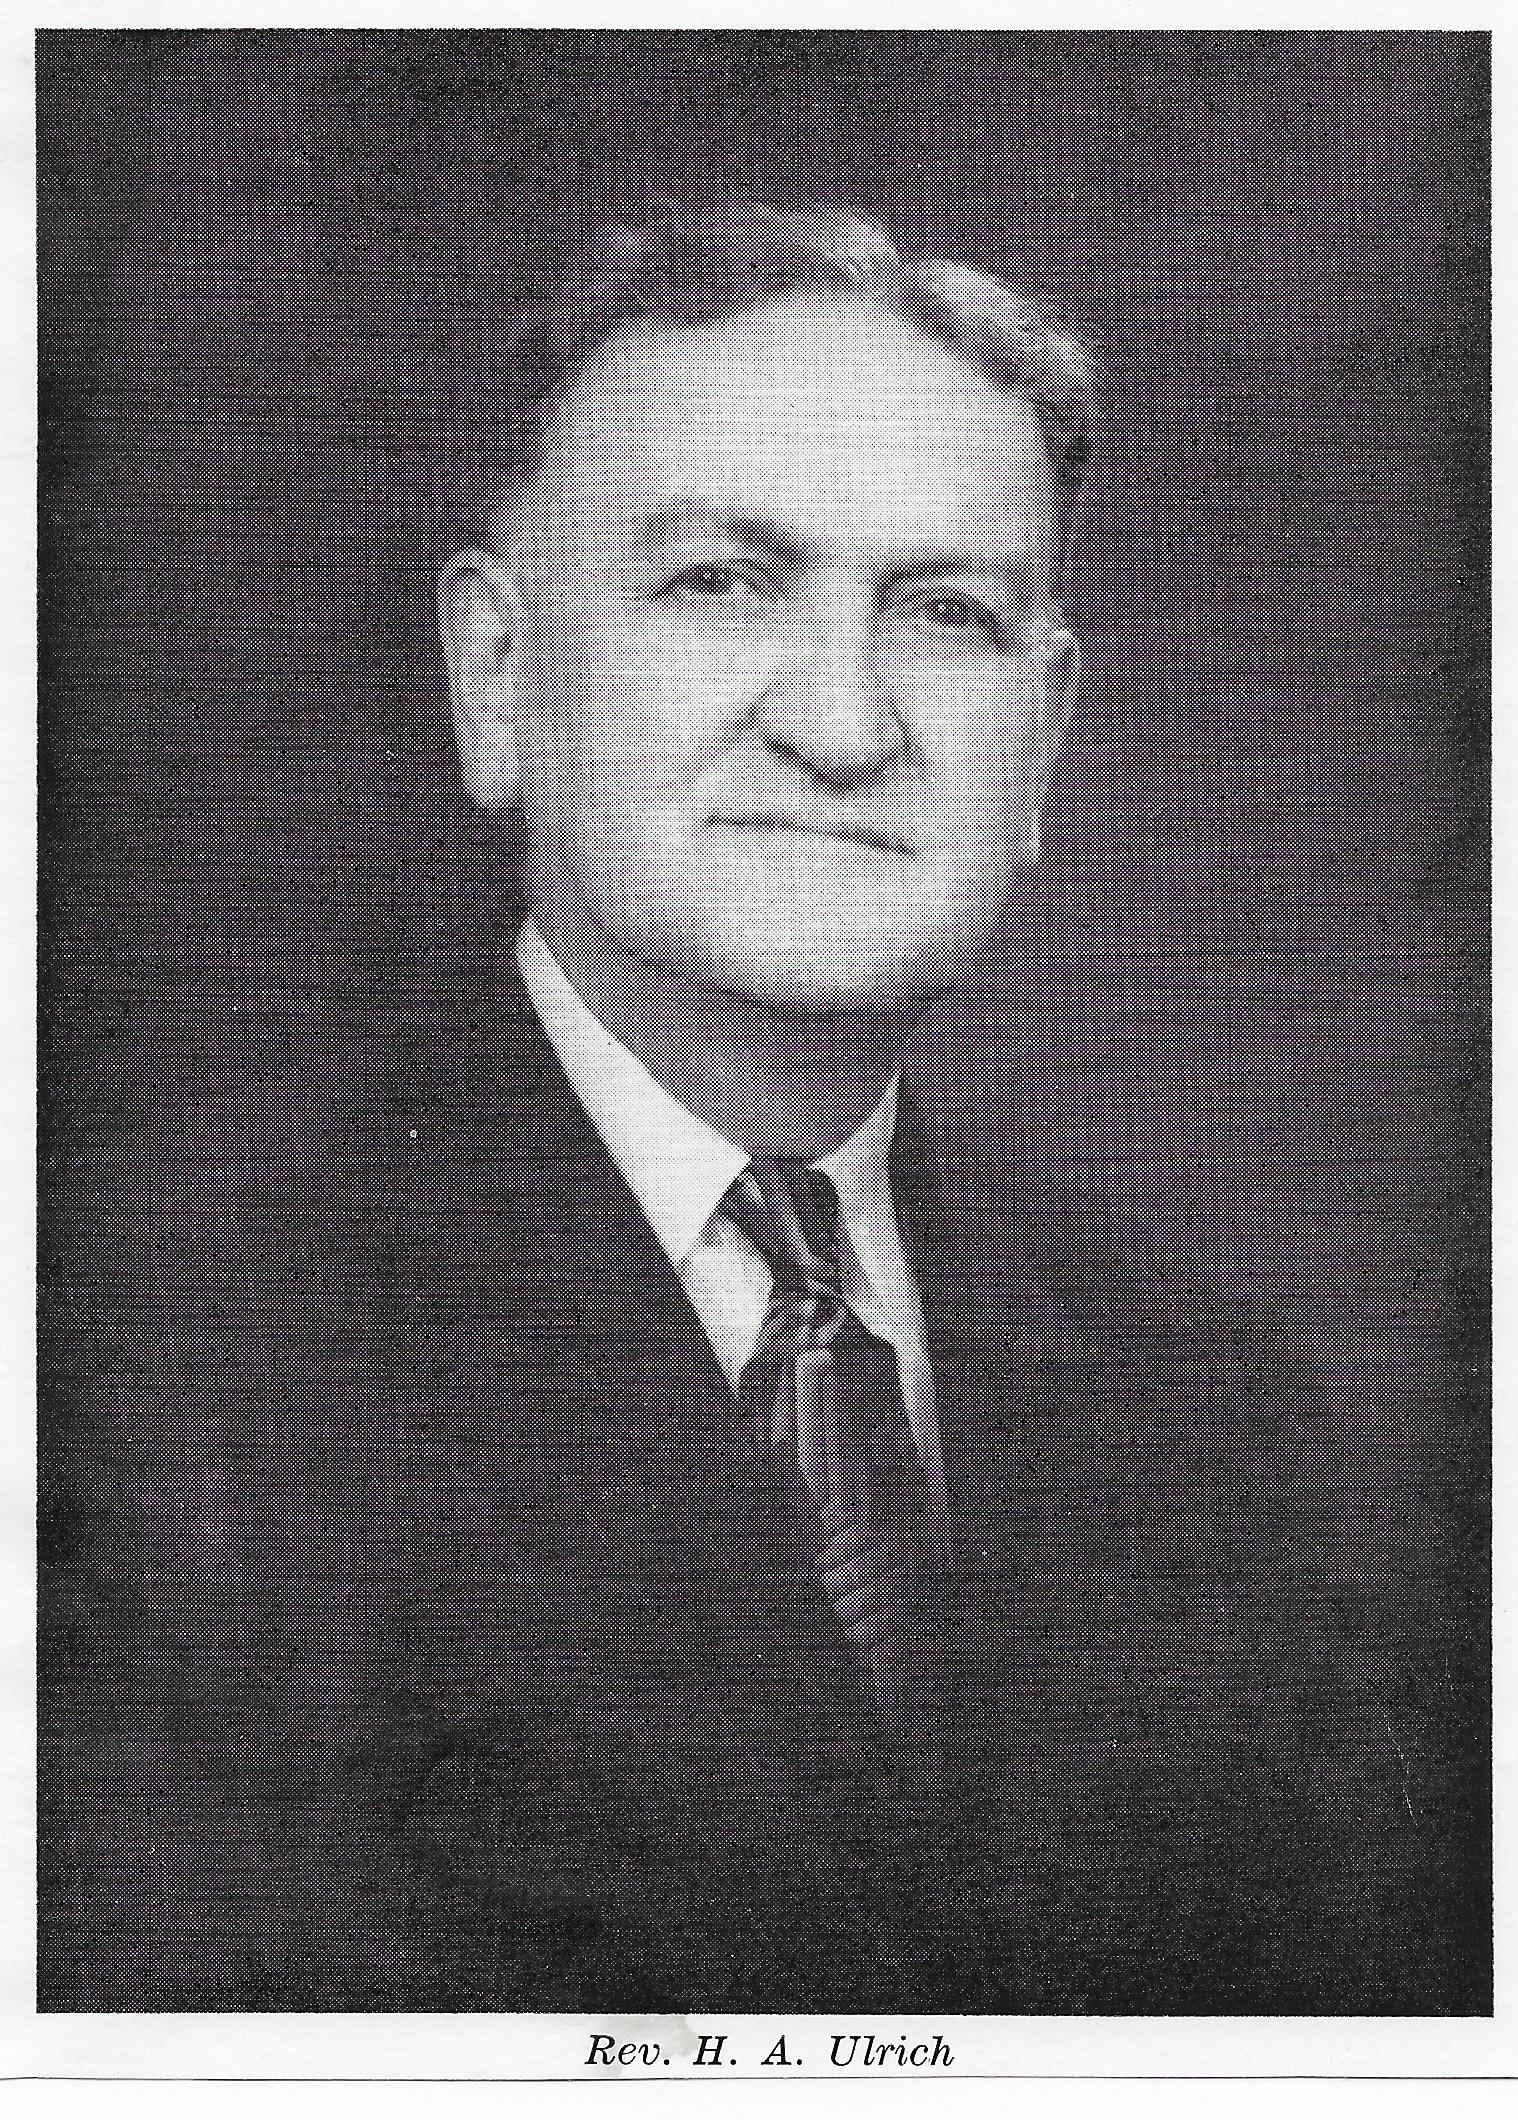 Rev. H.A. Ulrich